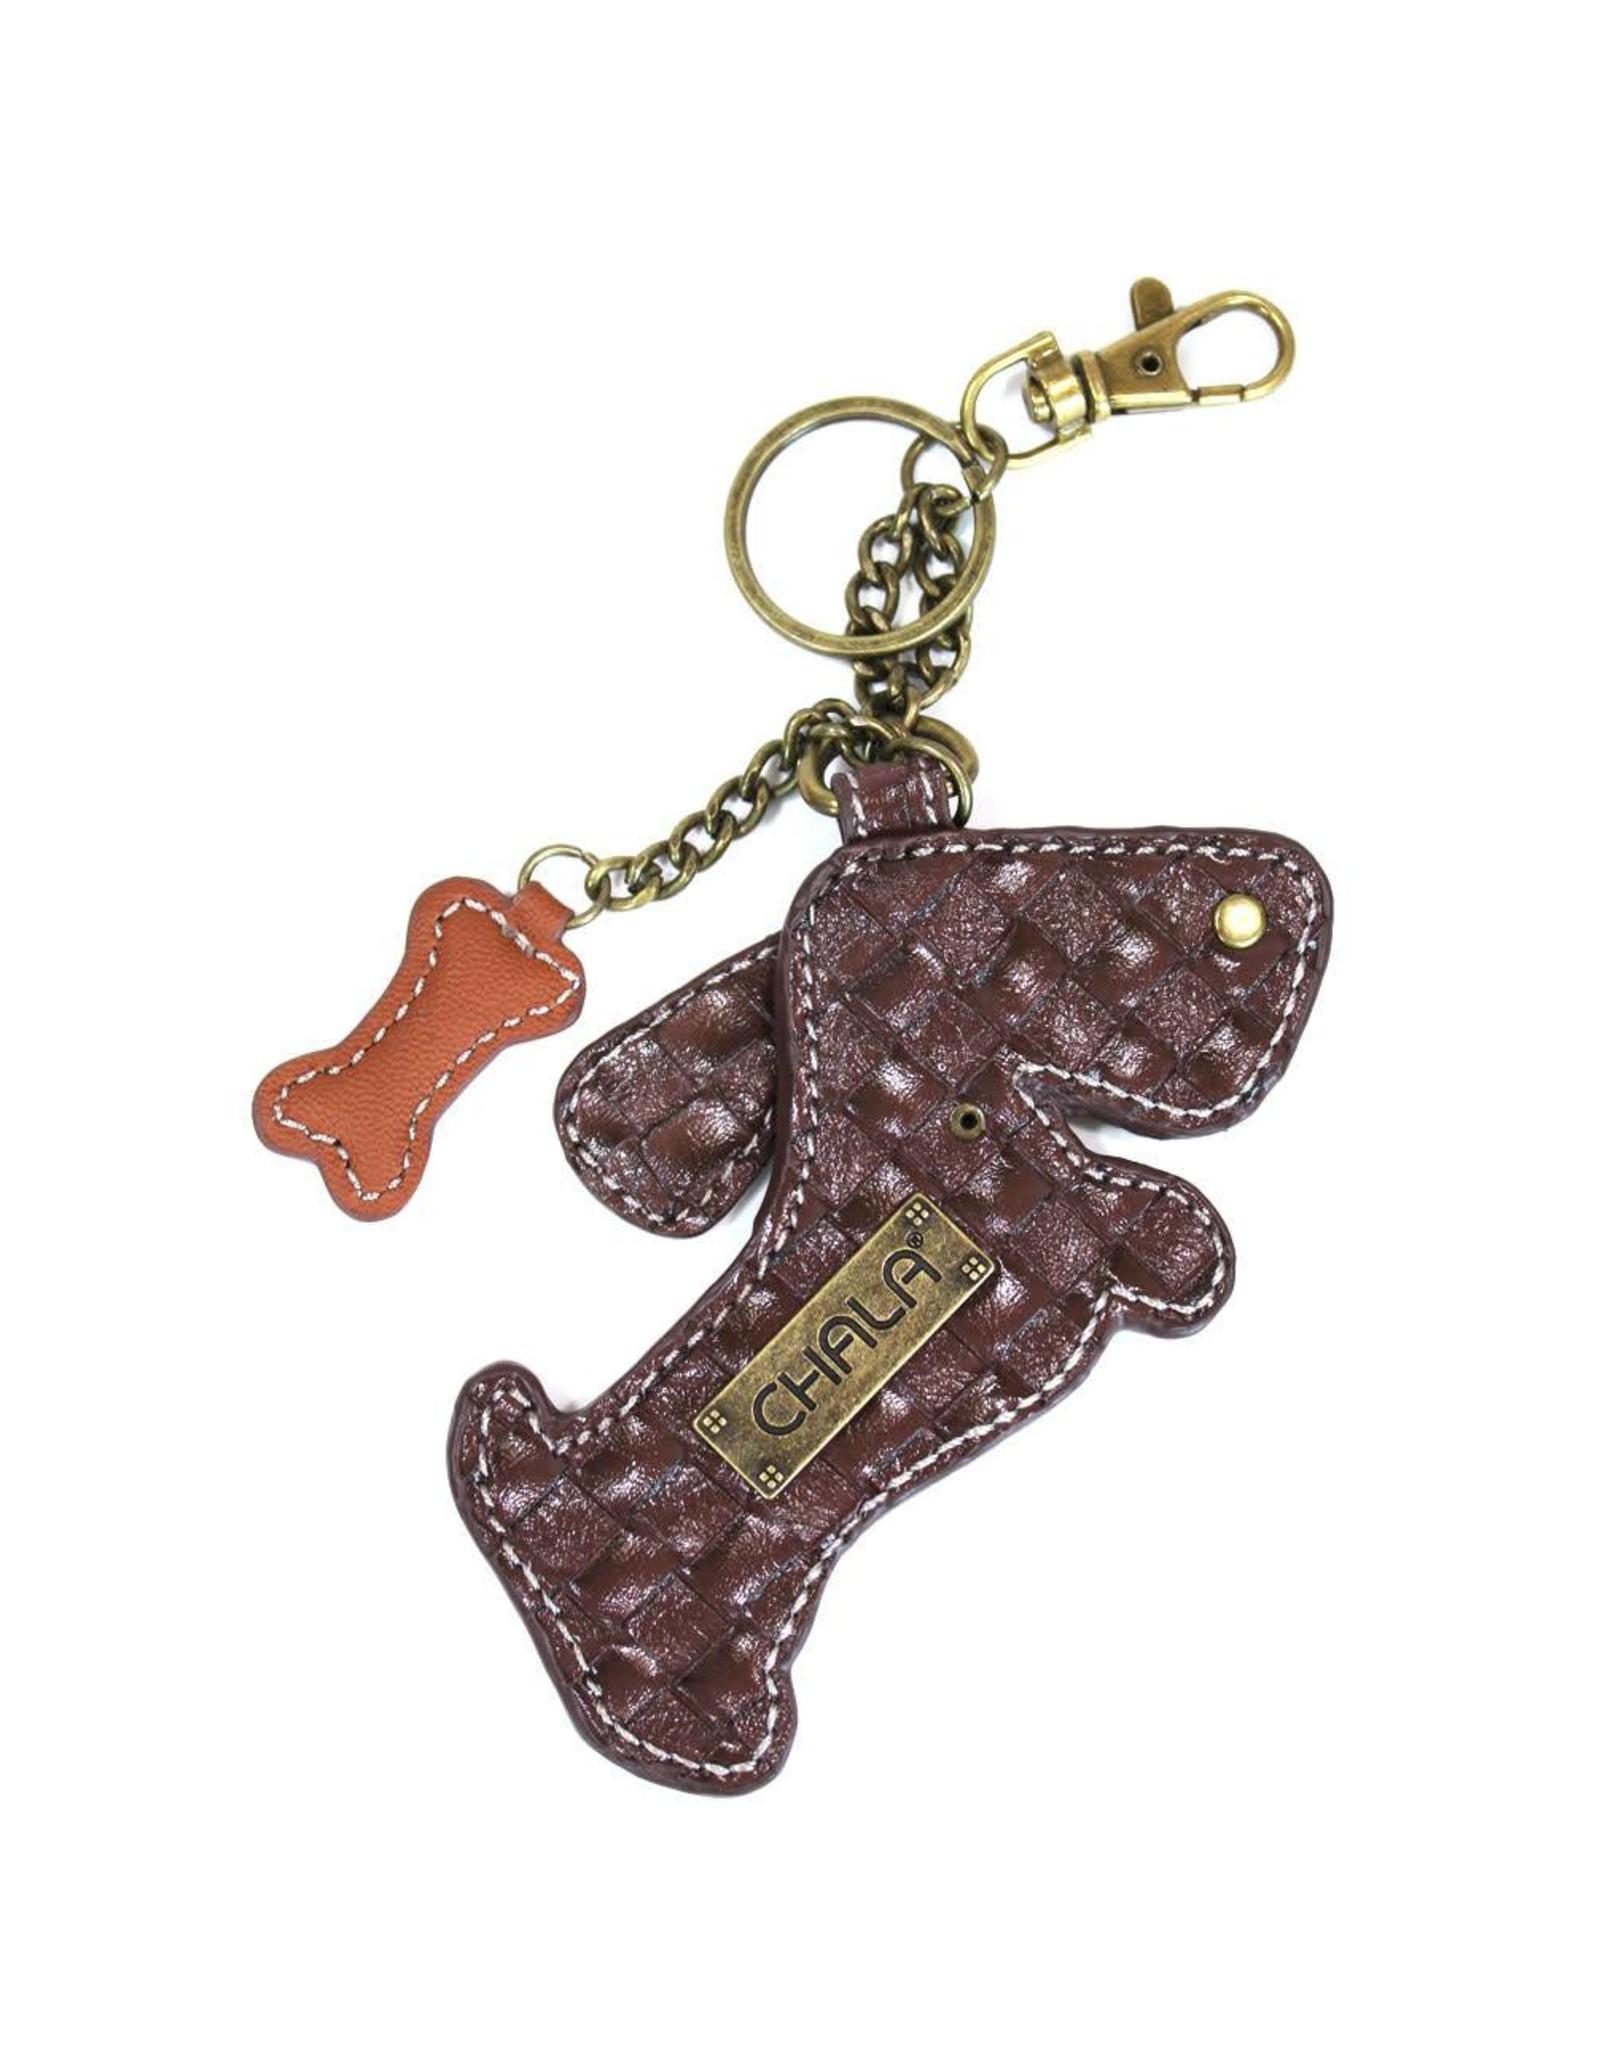 Chala Key Fob Wiener Dog